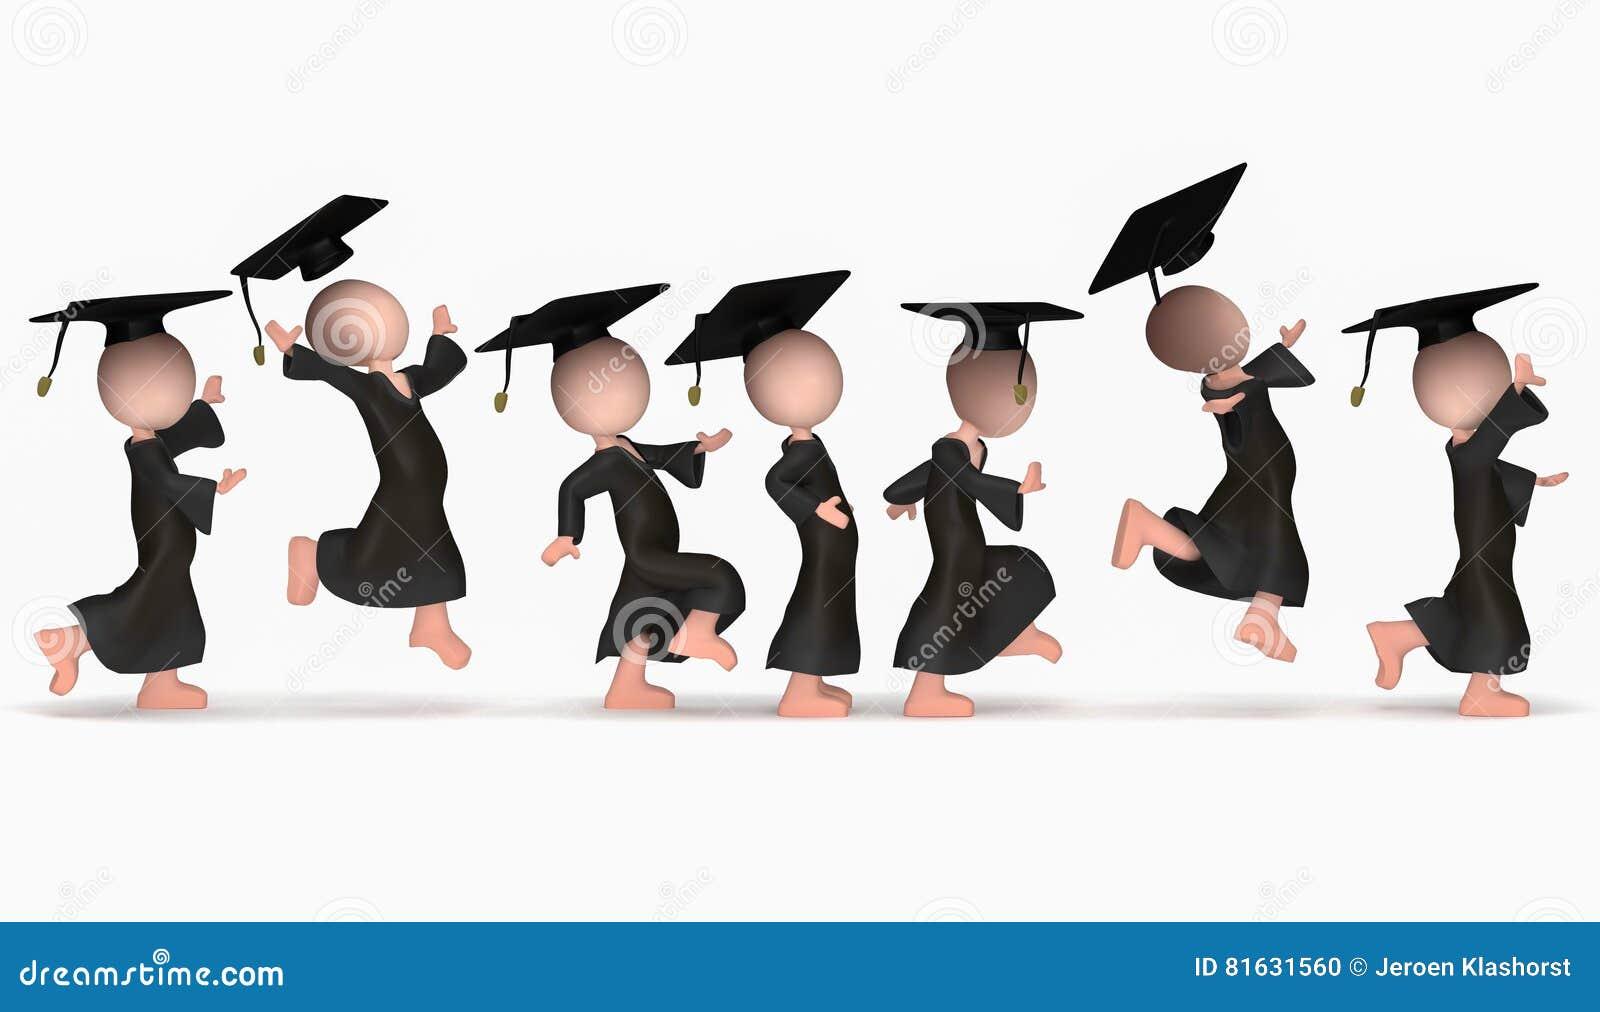 Jumping happy school cumloude